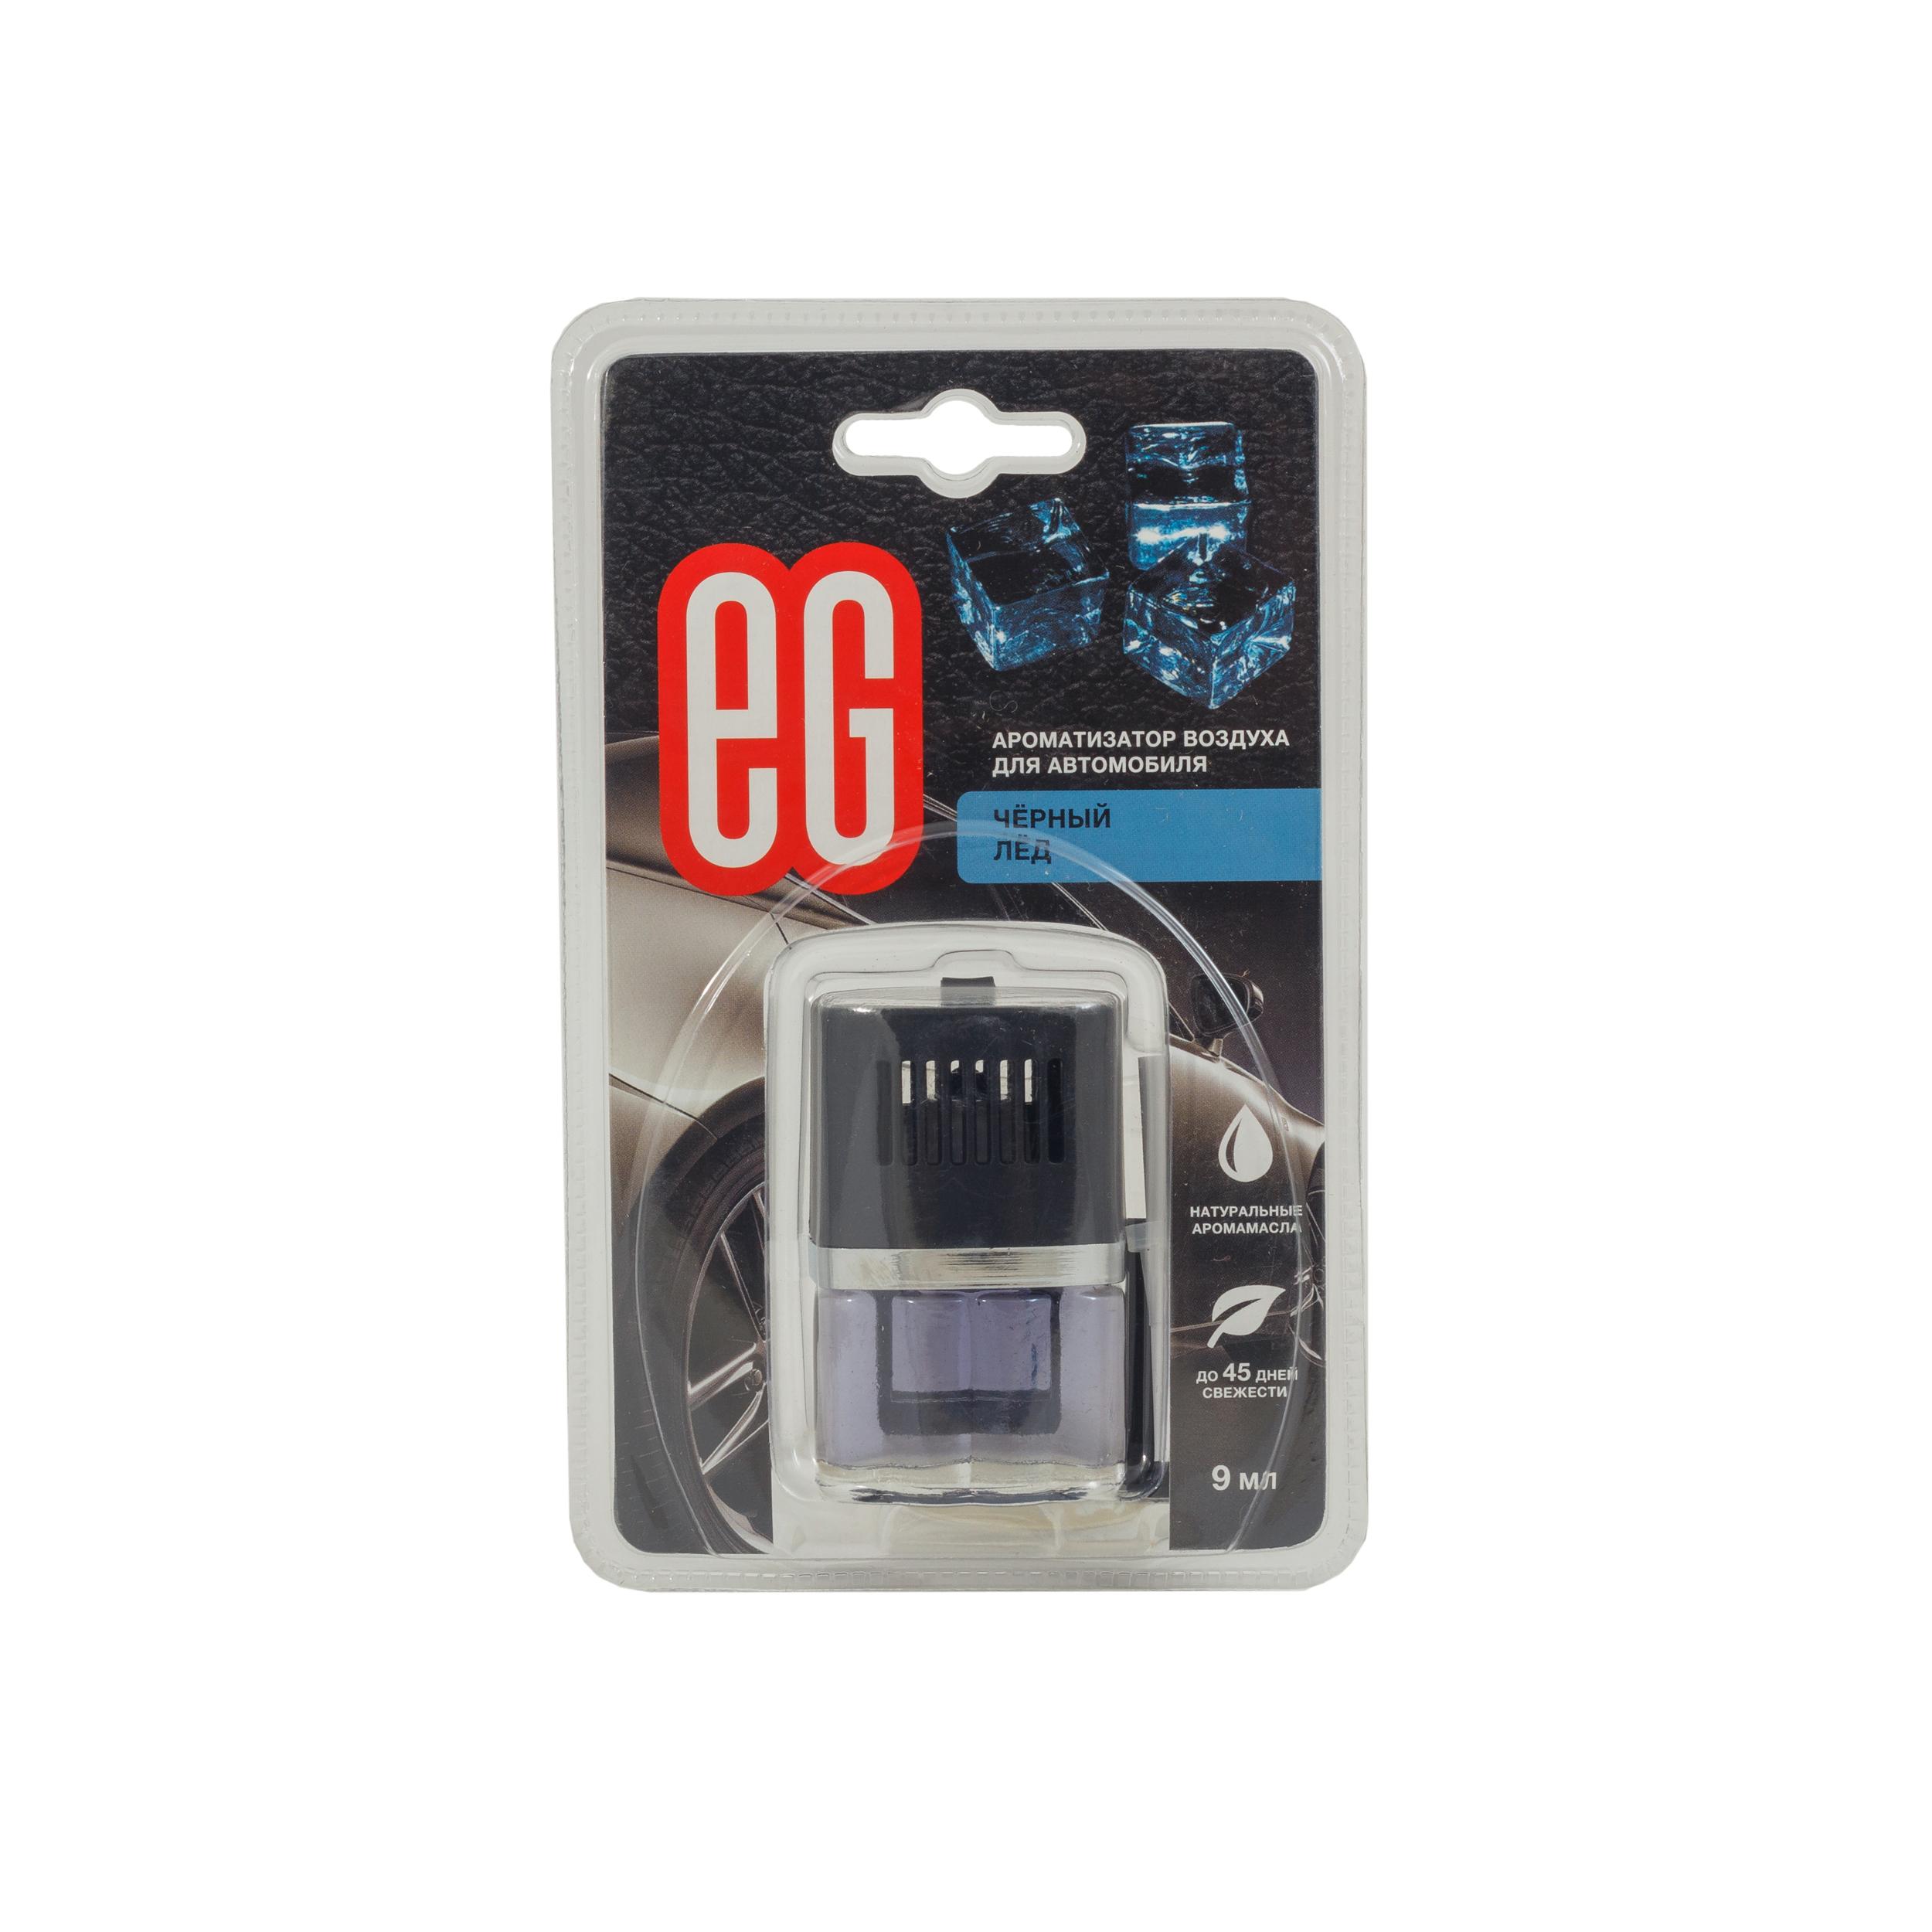 Ароматизатор на дефлектор 9мл черный лед EG